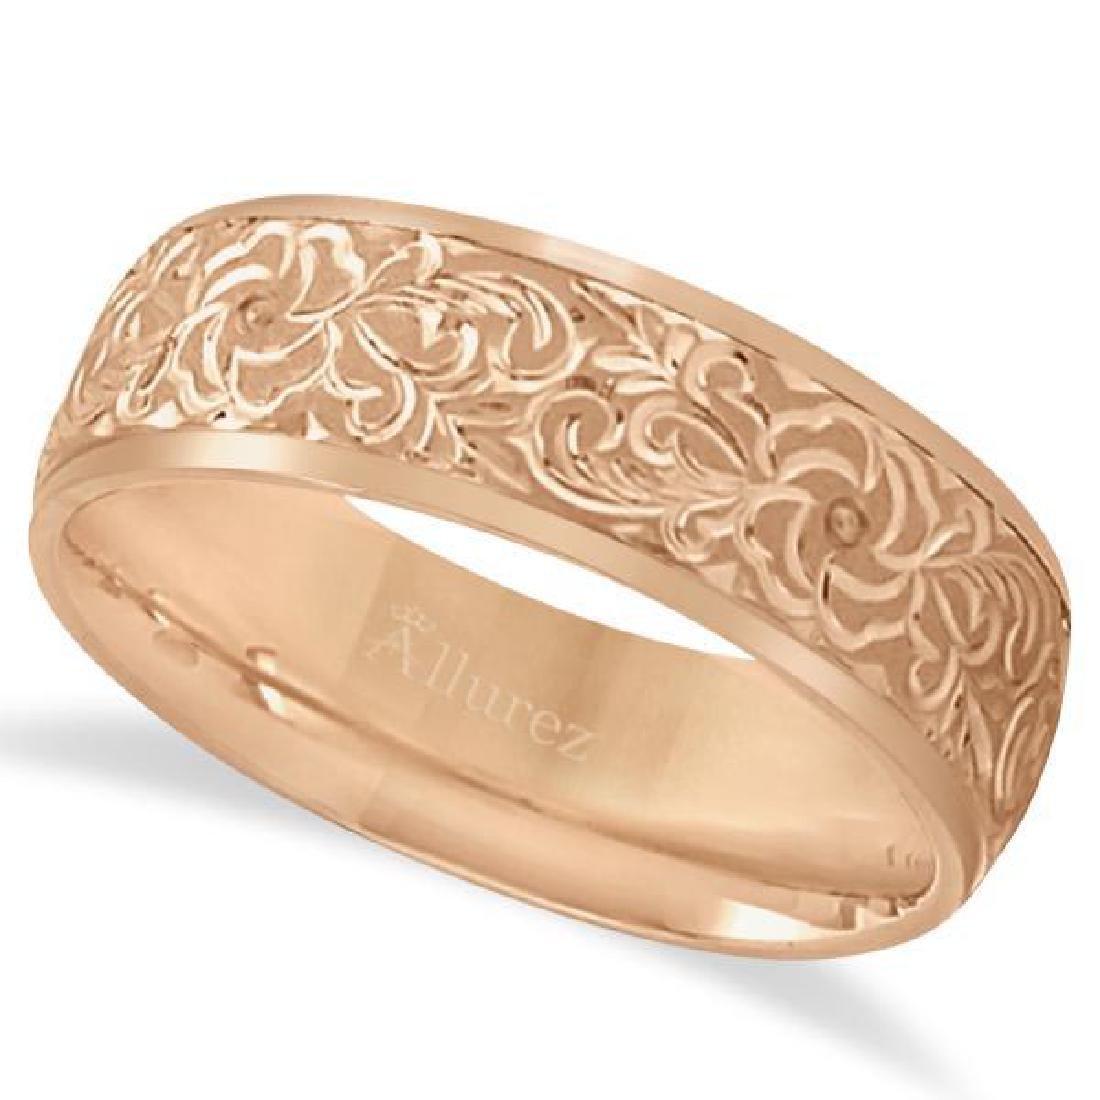 Hand-Engraved Flower Wedding Ring Wide Band 14k Rose Go